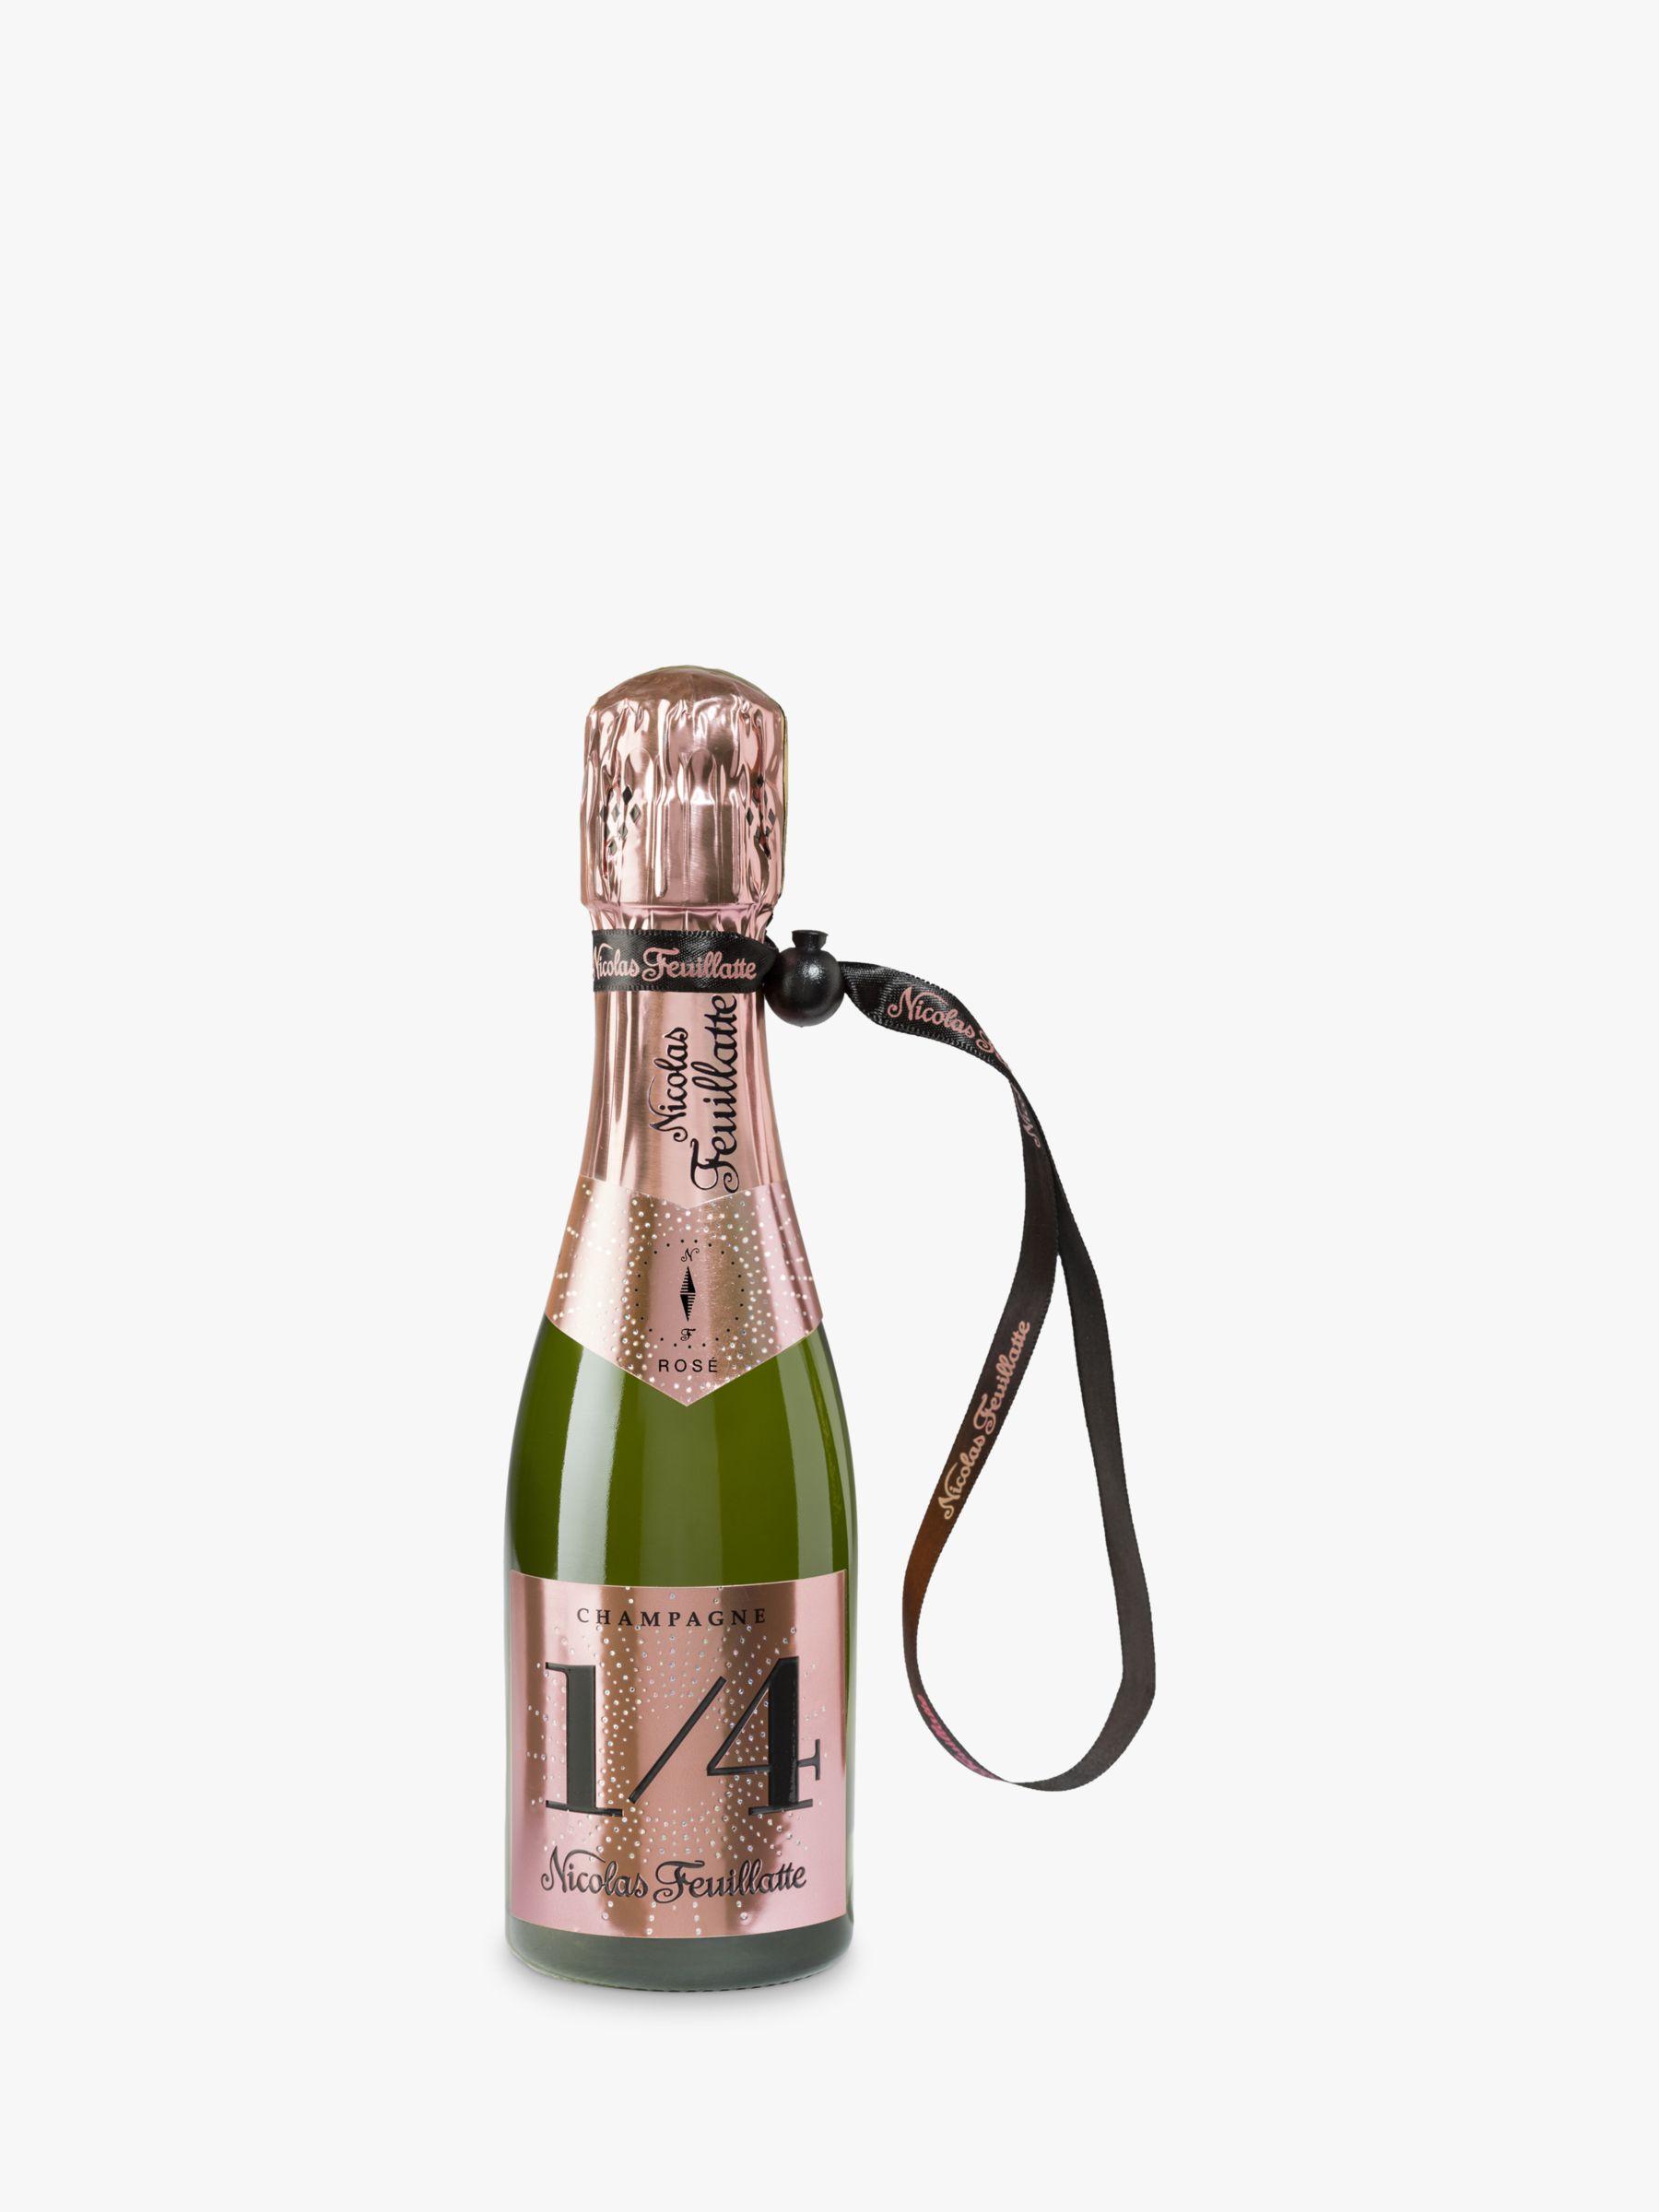 Nicolas Feuillatte Champagne Nicolas Feuillatte One Fo(u)r Rose with a Jacket, 20cl